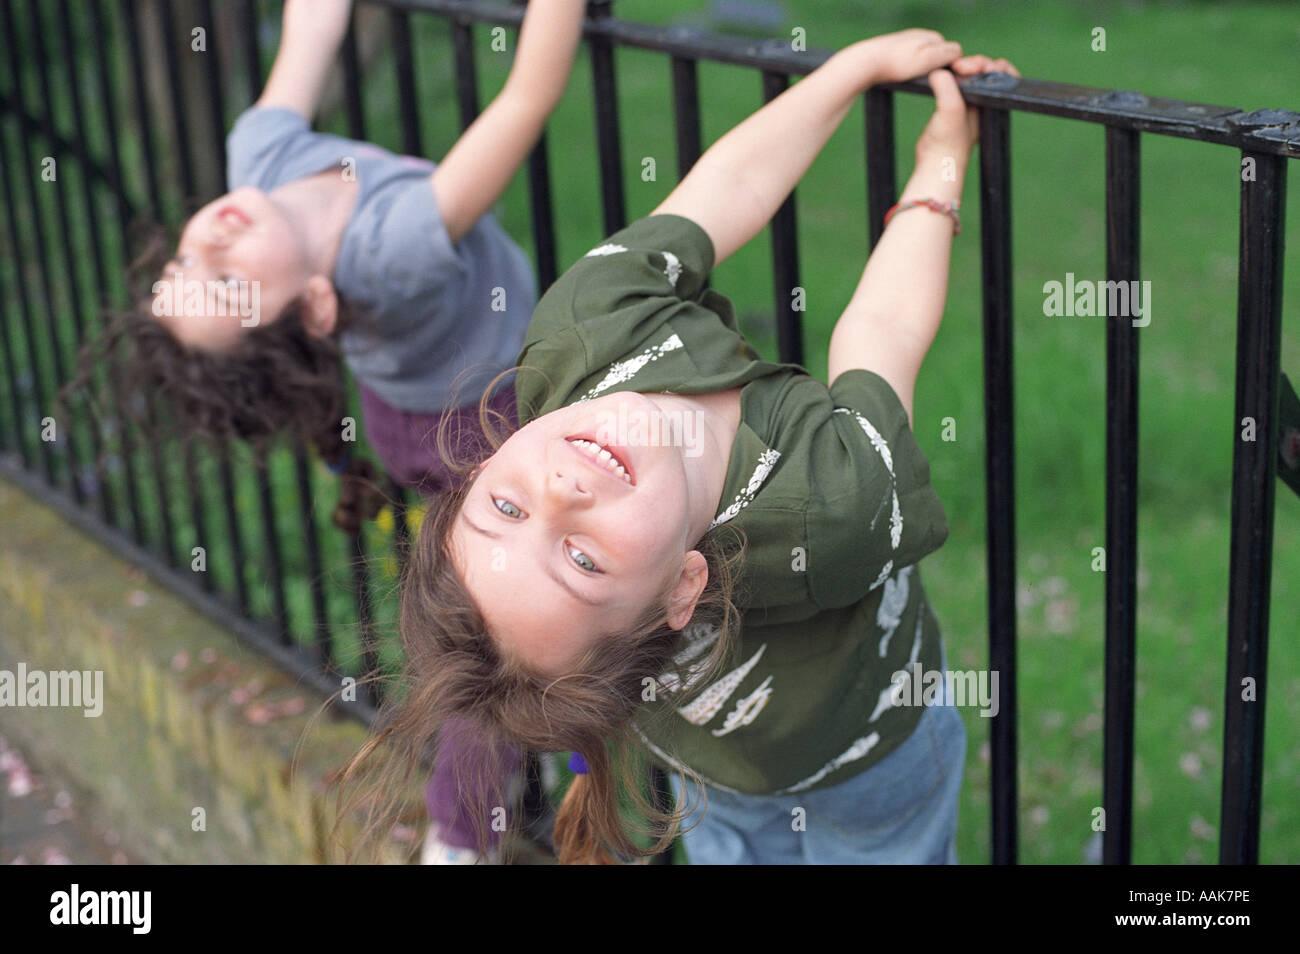 Two six year old girls playing on metal railings, London, UK. Stock Foto